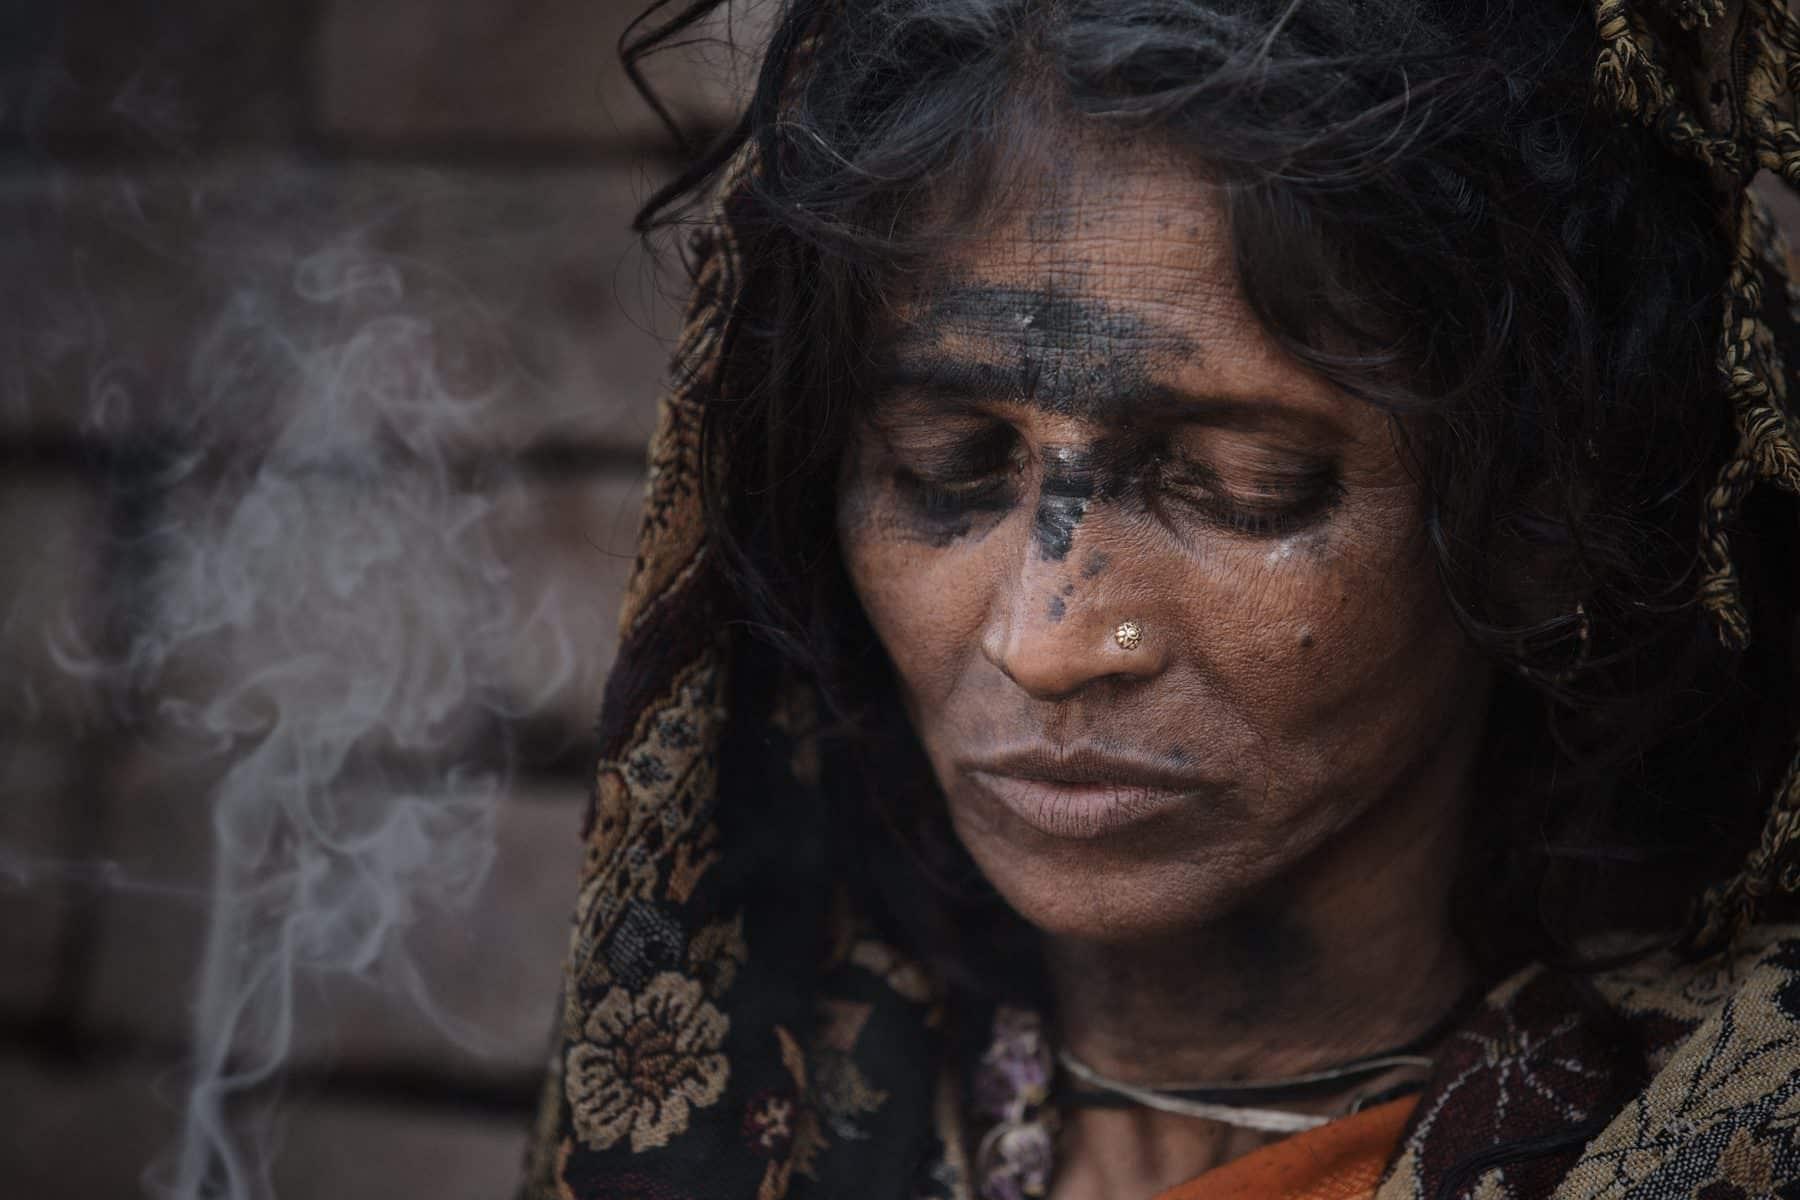 India, Varanasi, Street Photography, Mystical Woman